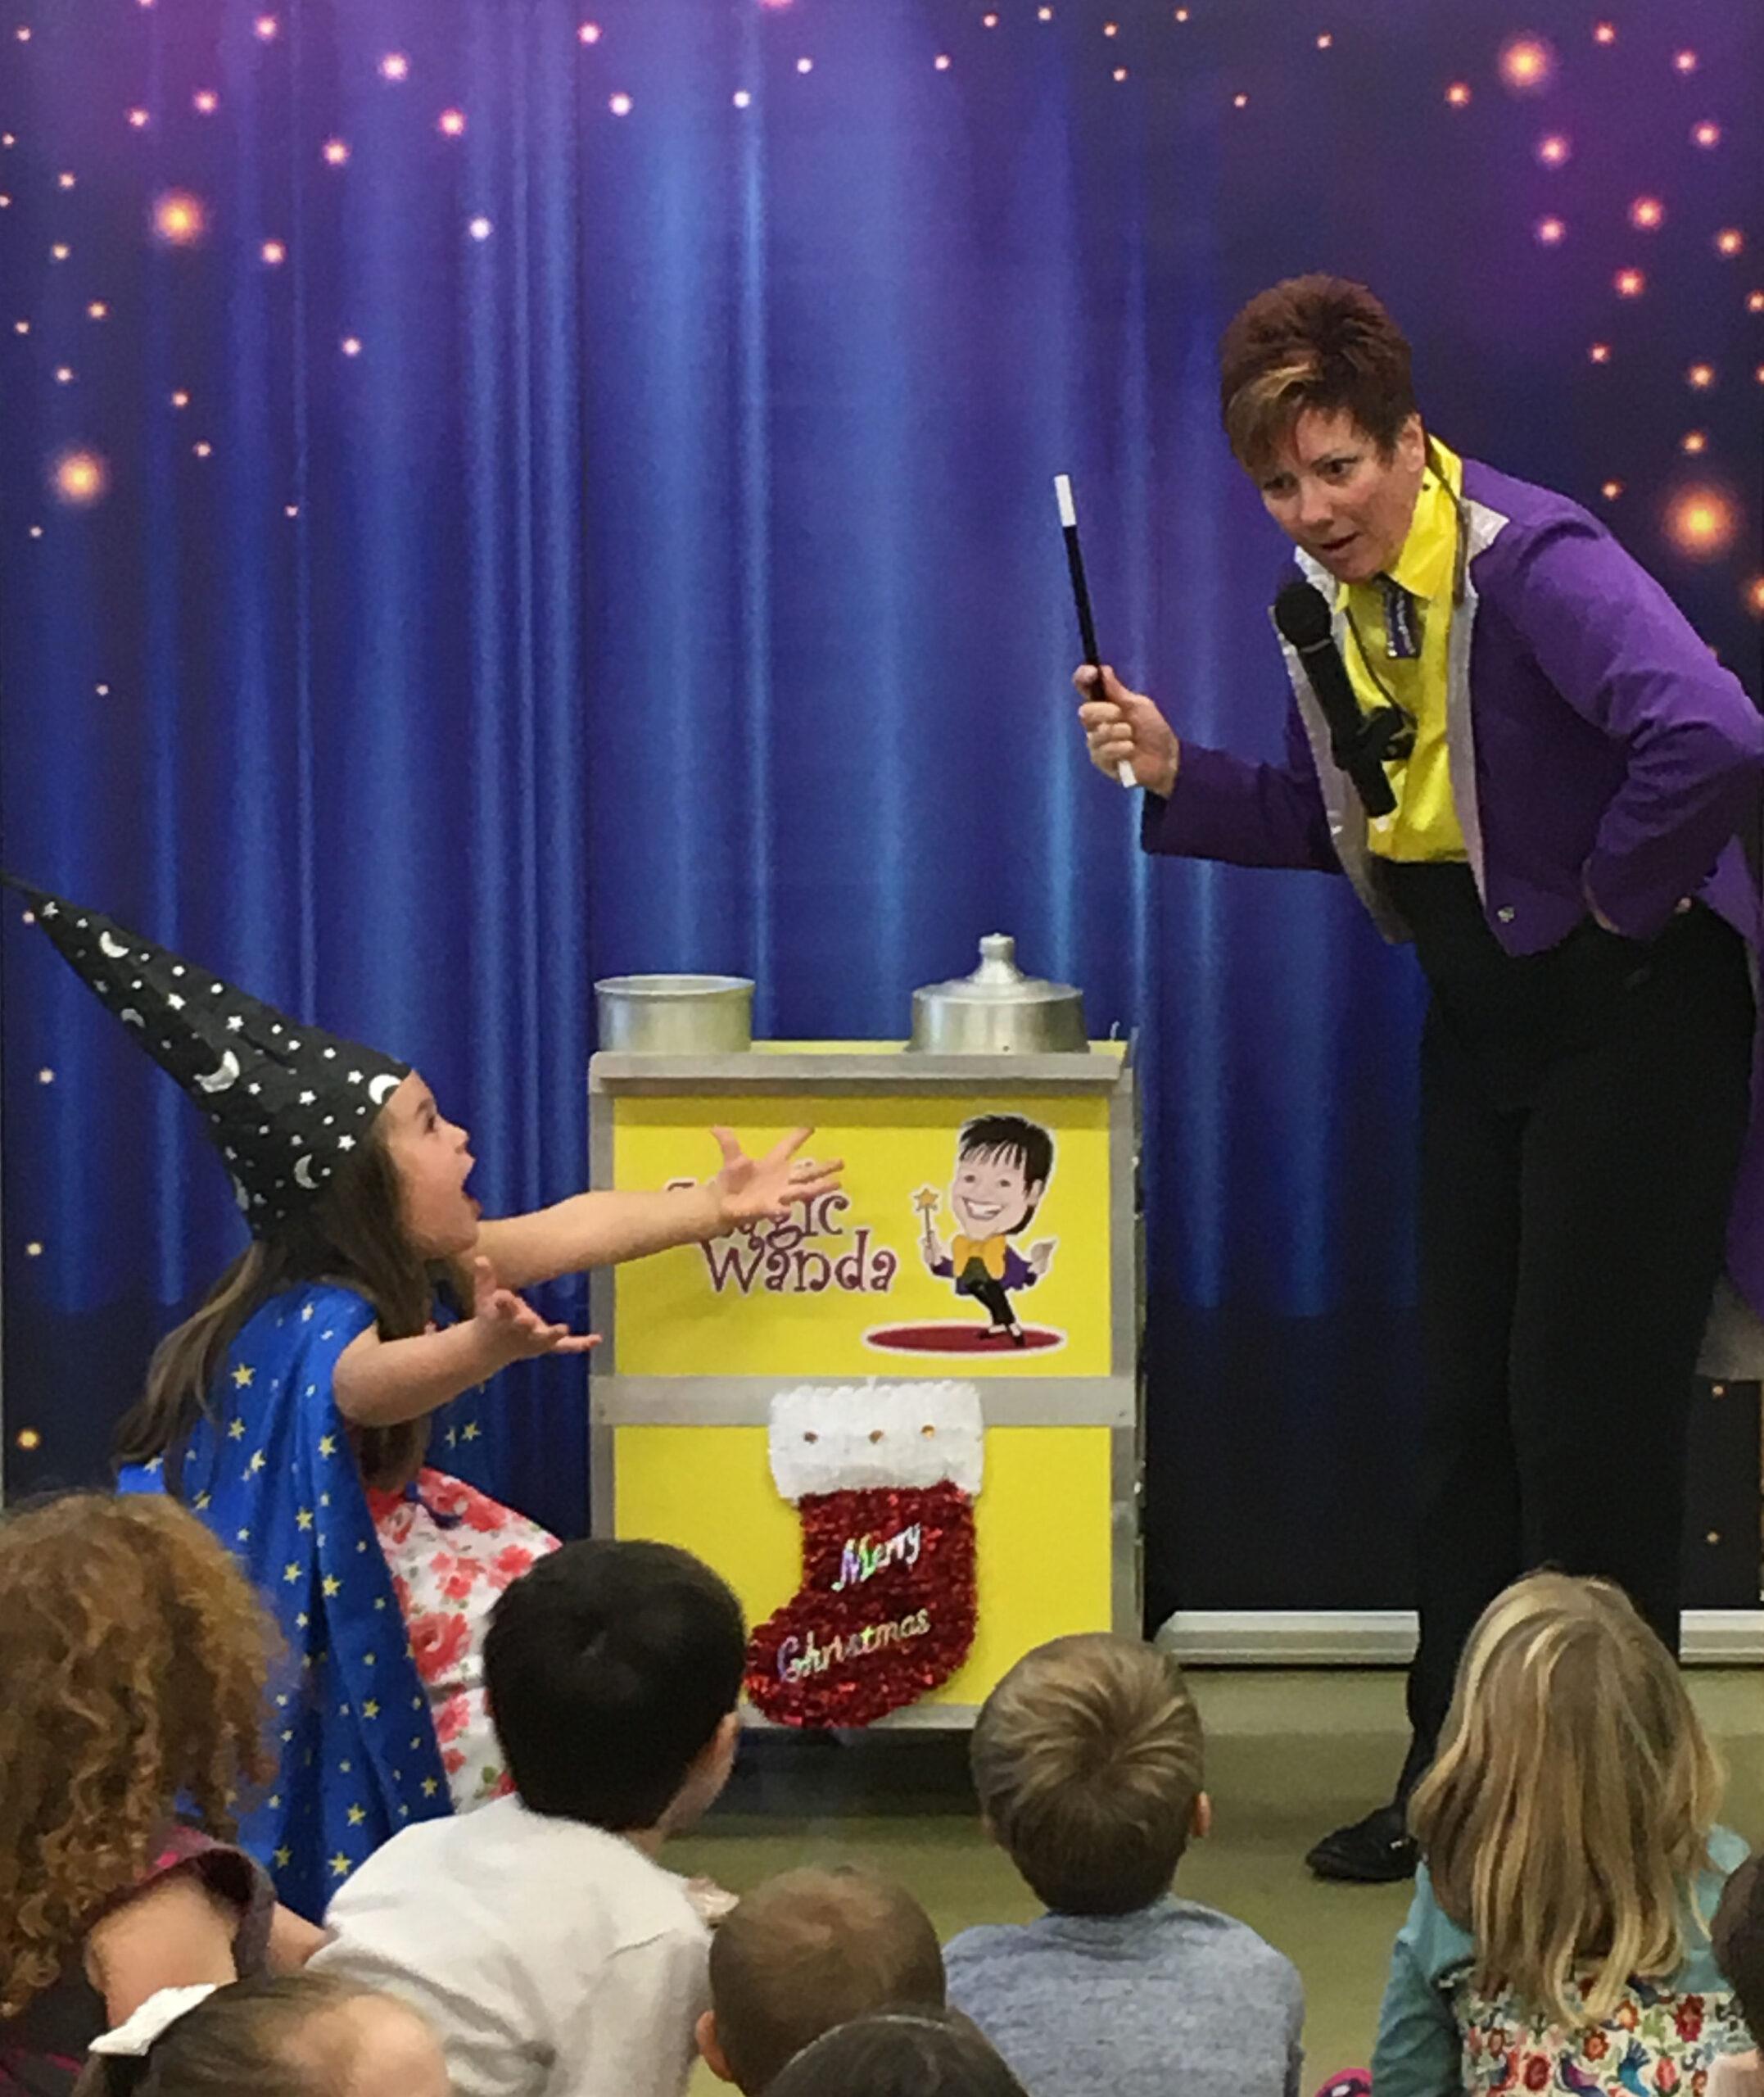 Magic Wanda with the birthday girl